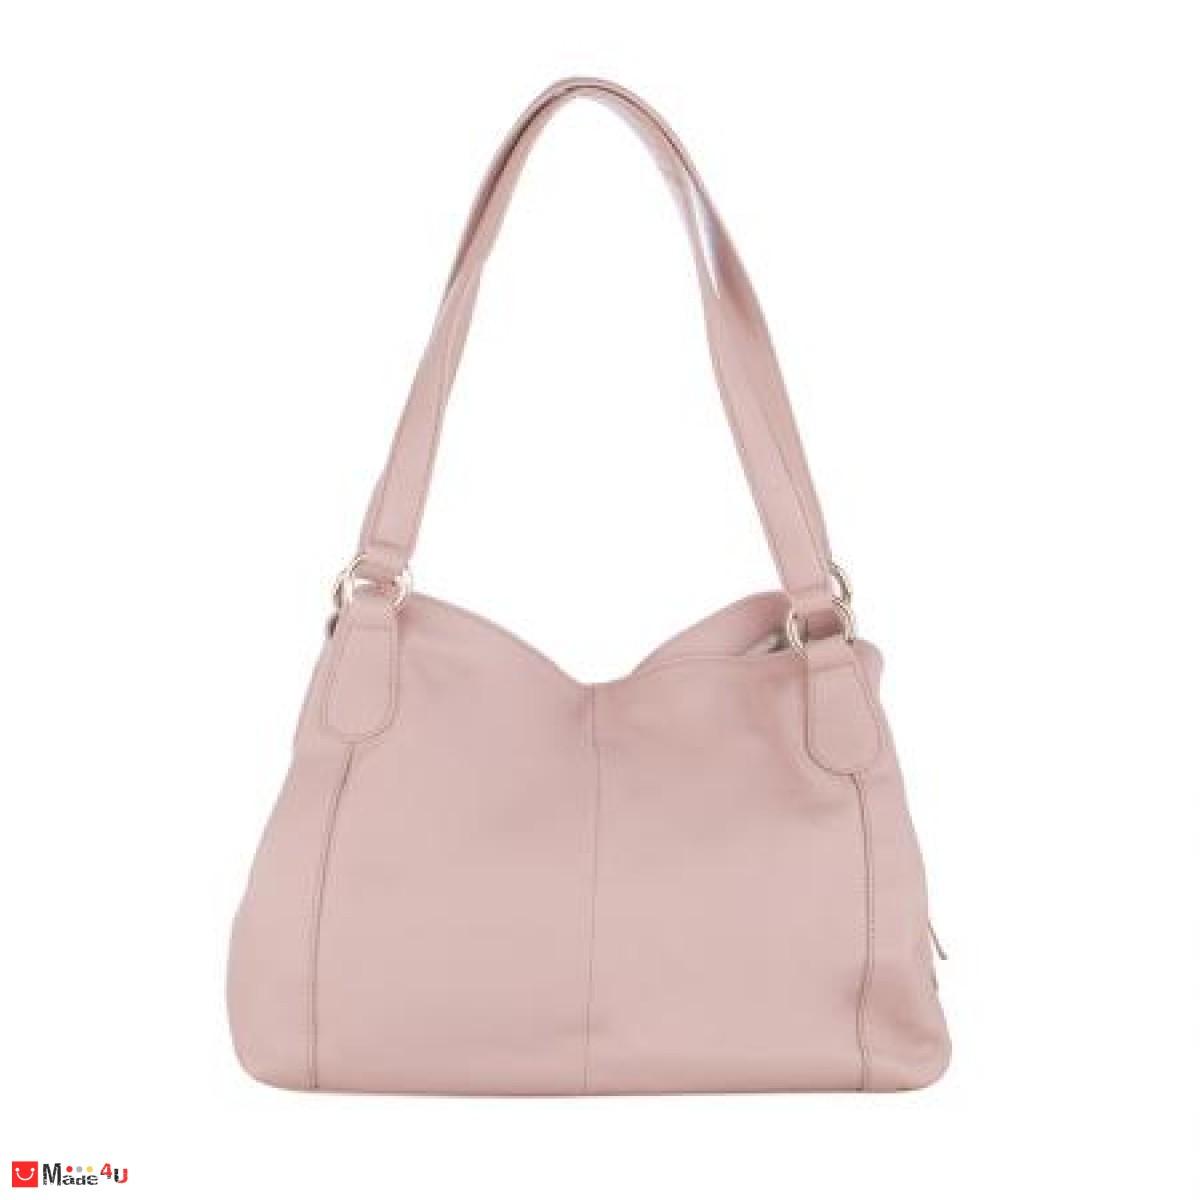 Дамска чанта естествена кожа 21х40см, перлено розово